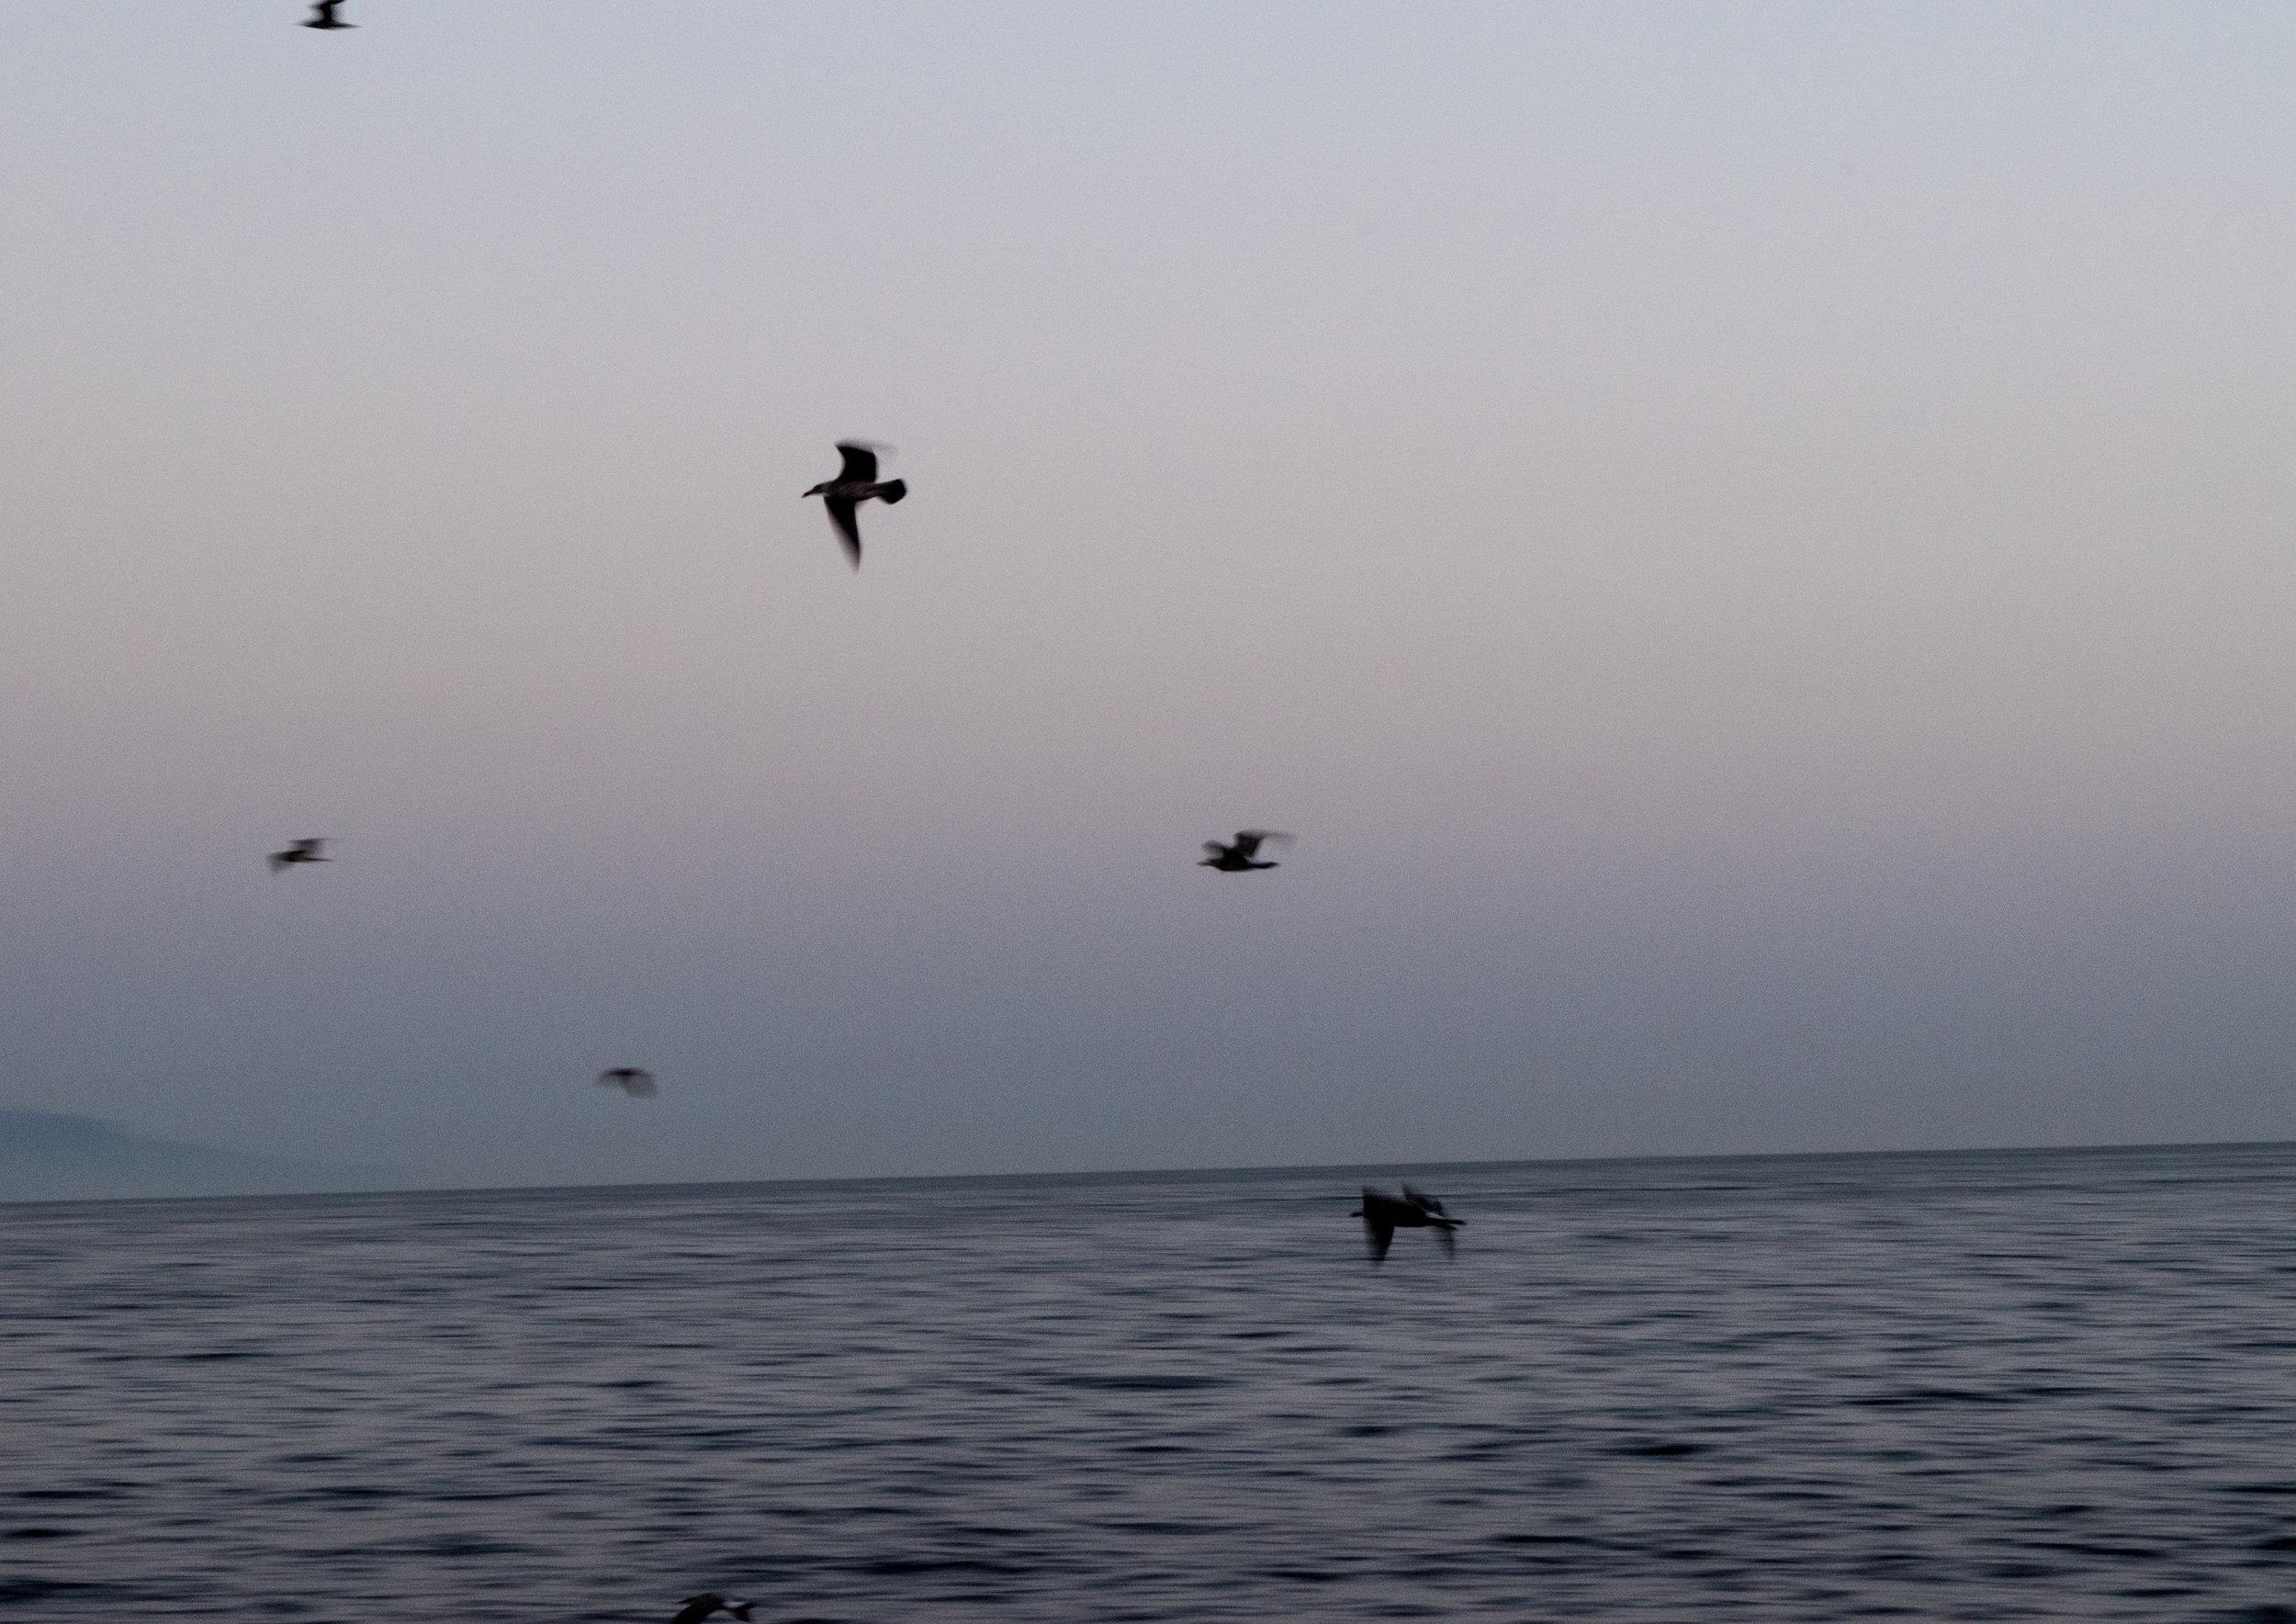 BIRDS OFF THE COAST OF NAPLES